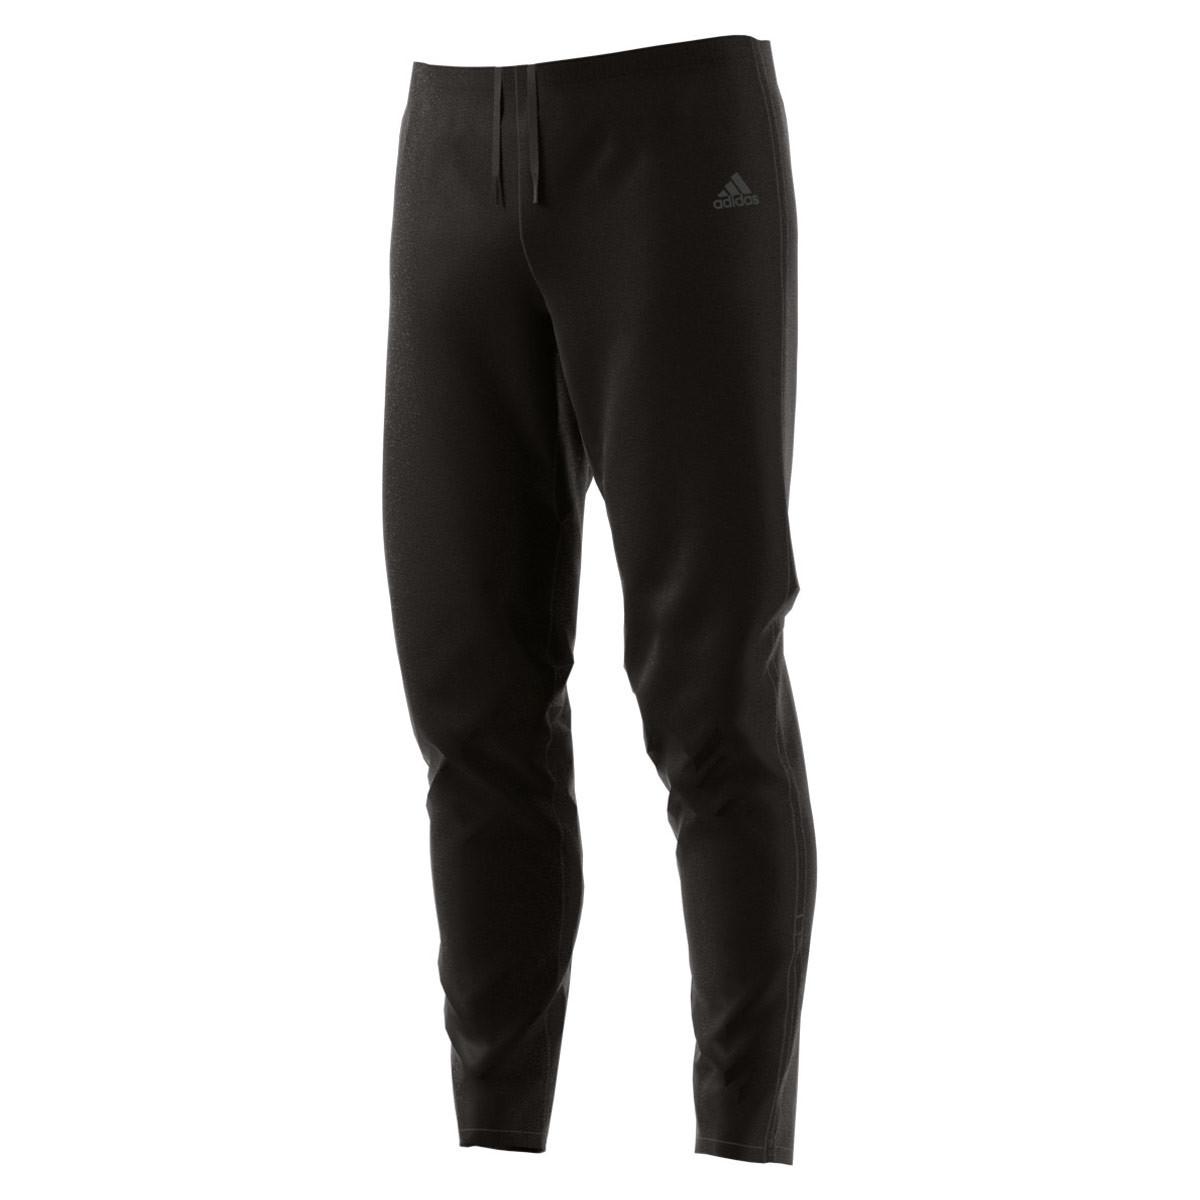 23d75905758 adidas Response Track Pant - Running trousers for Men - Black   21RUN